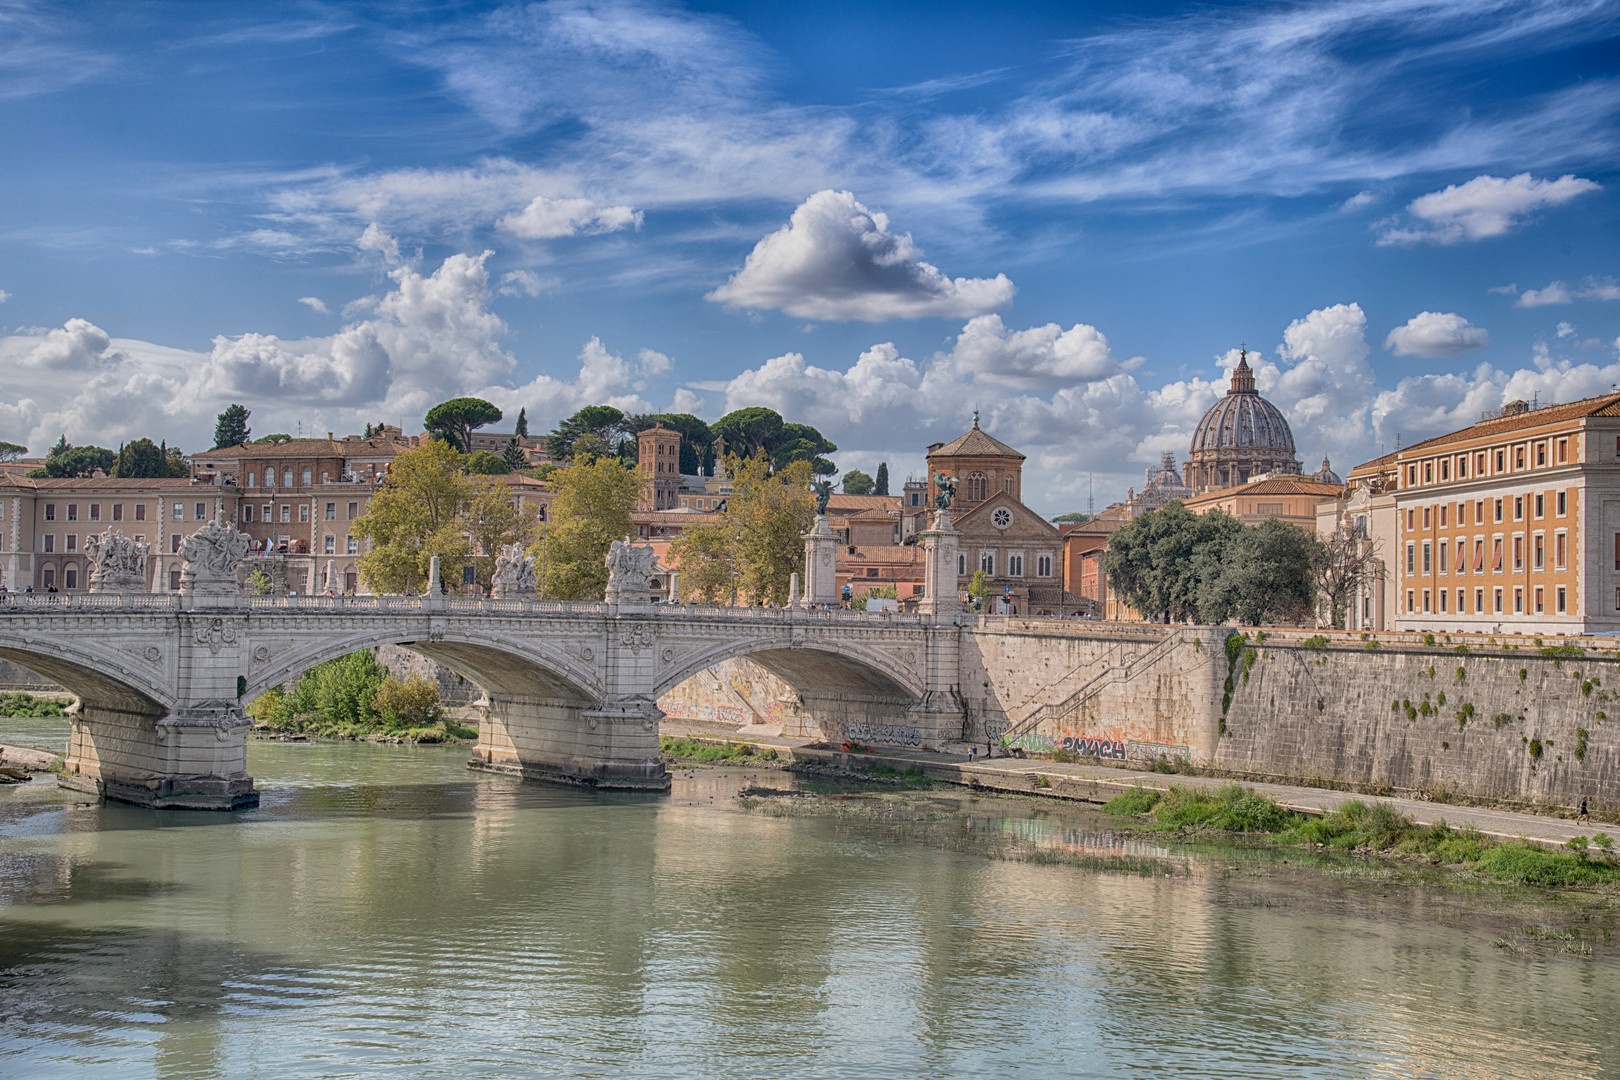 Tiber River - A.jpg